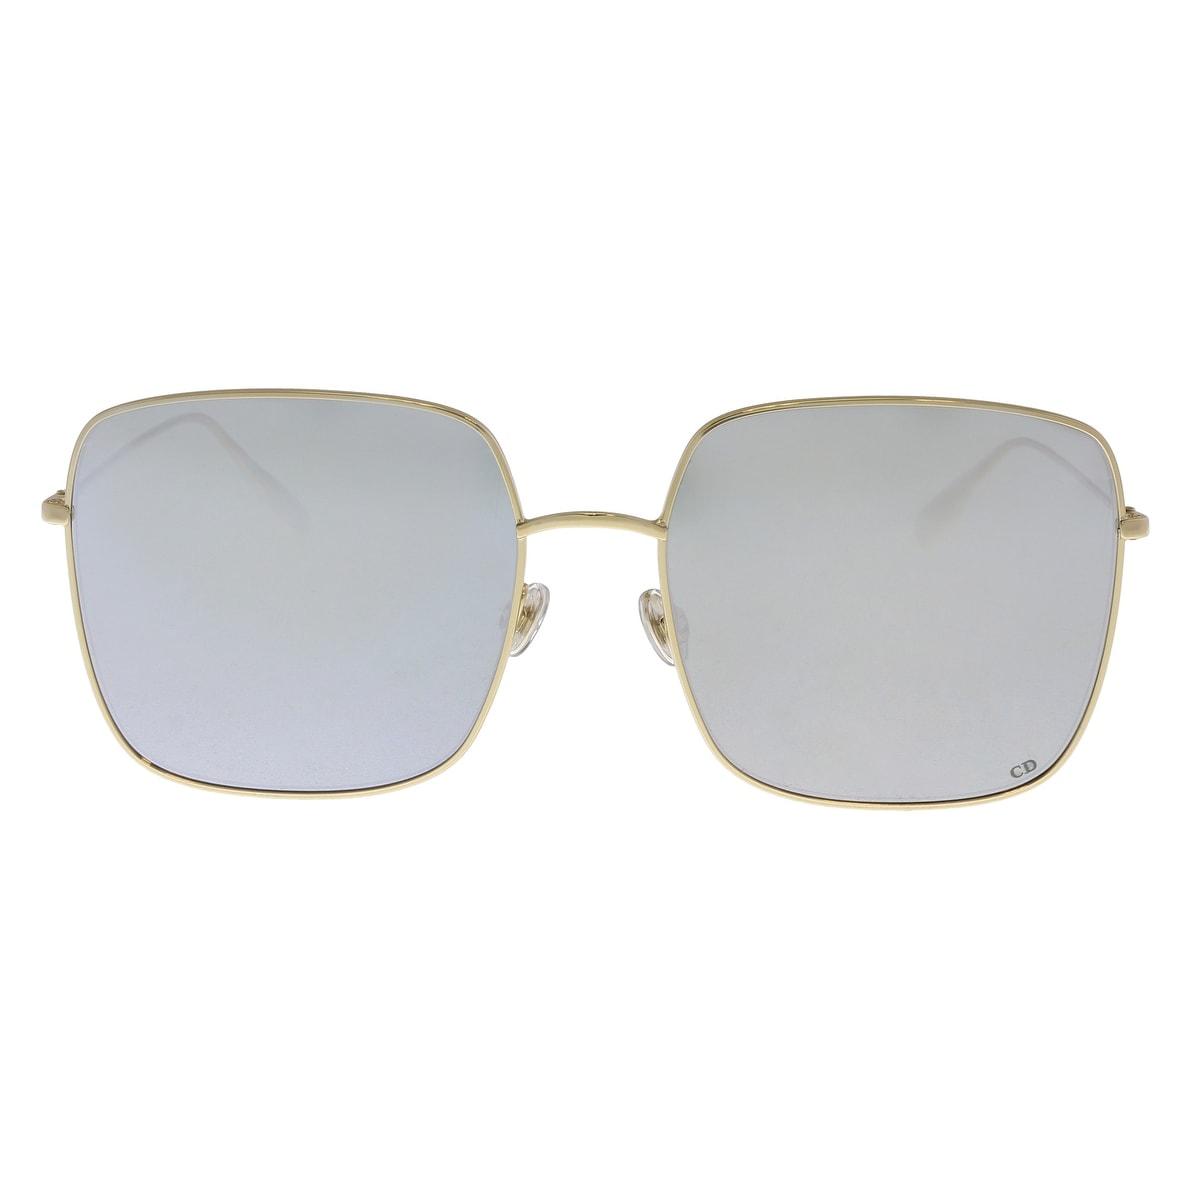 439b9d28e4 Shop Christian Dior DIORSTELLAIRE1 83I Gold Silver Square Sunglasses -  59-18-145 - Ships To Canada - Overstock.ca - 22302020